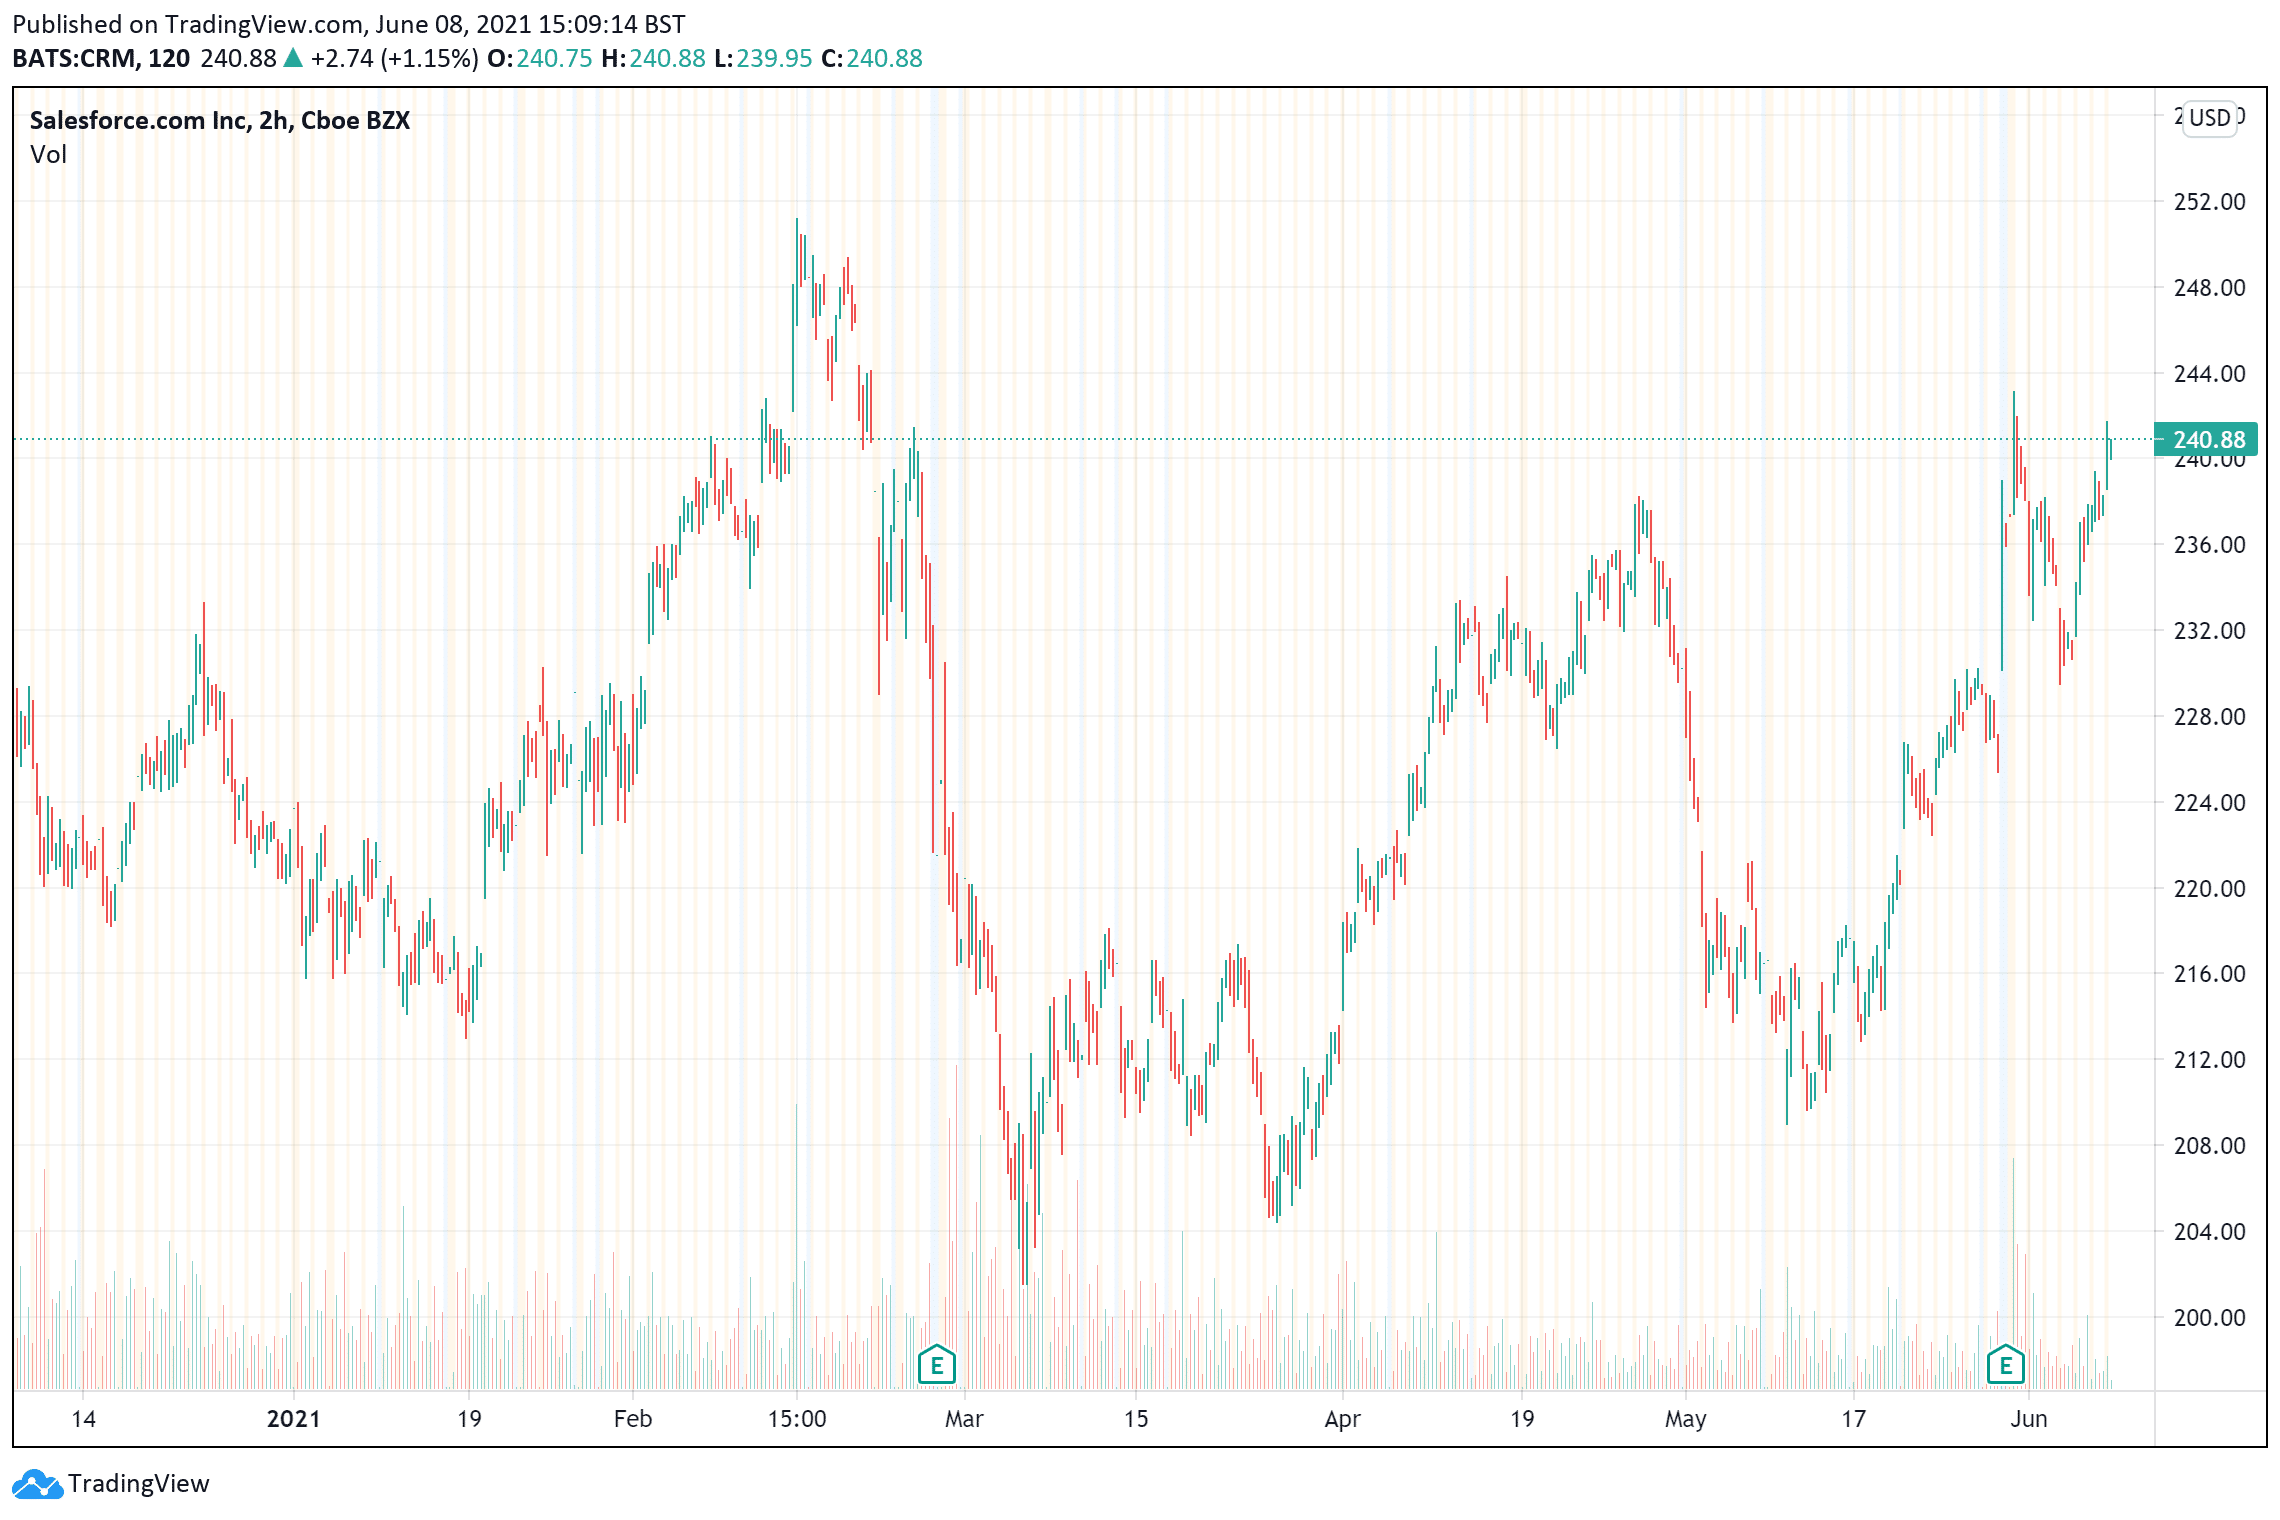 Slesforce price charts June 8